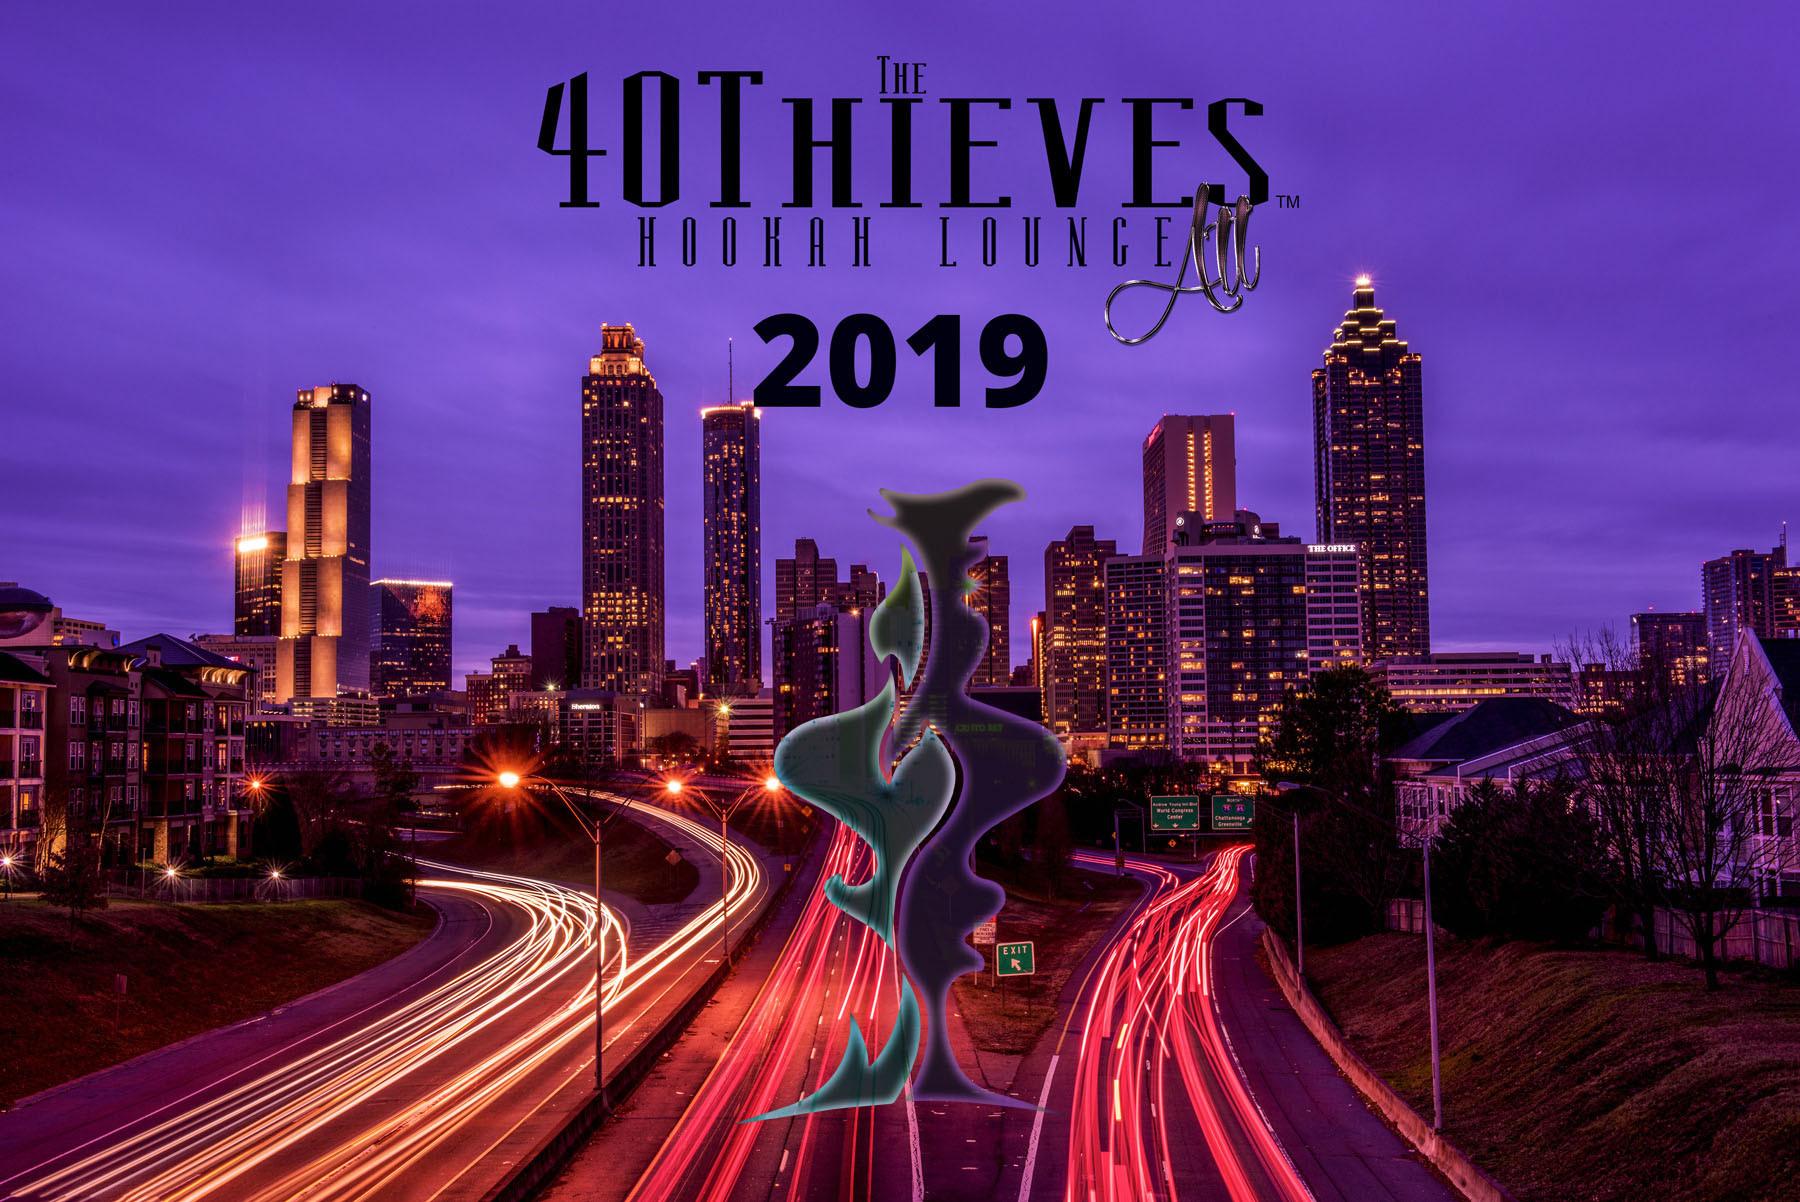 40 Thieves Atlanta 2019